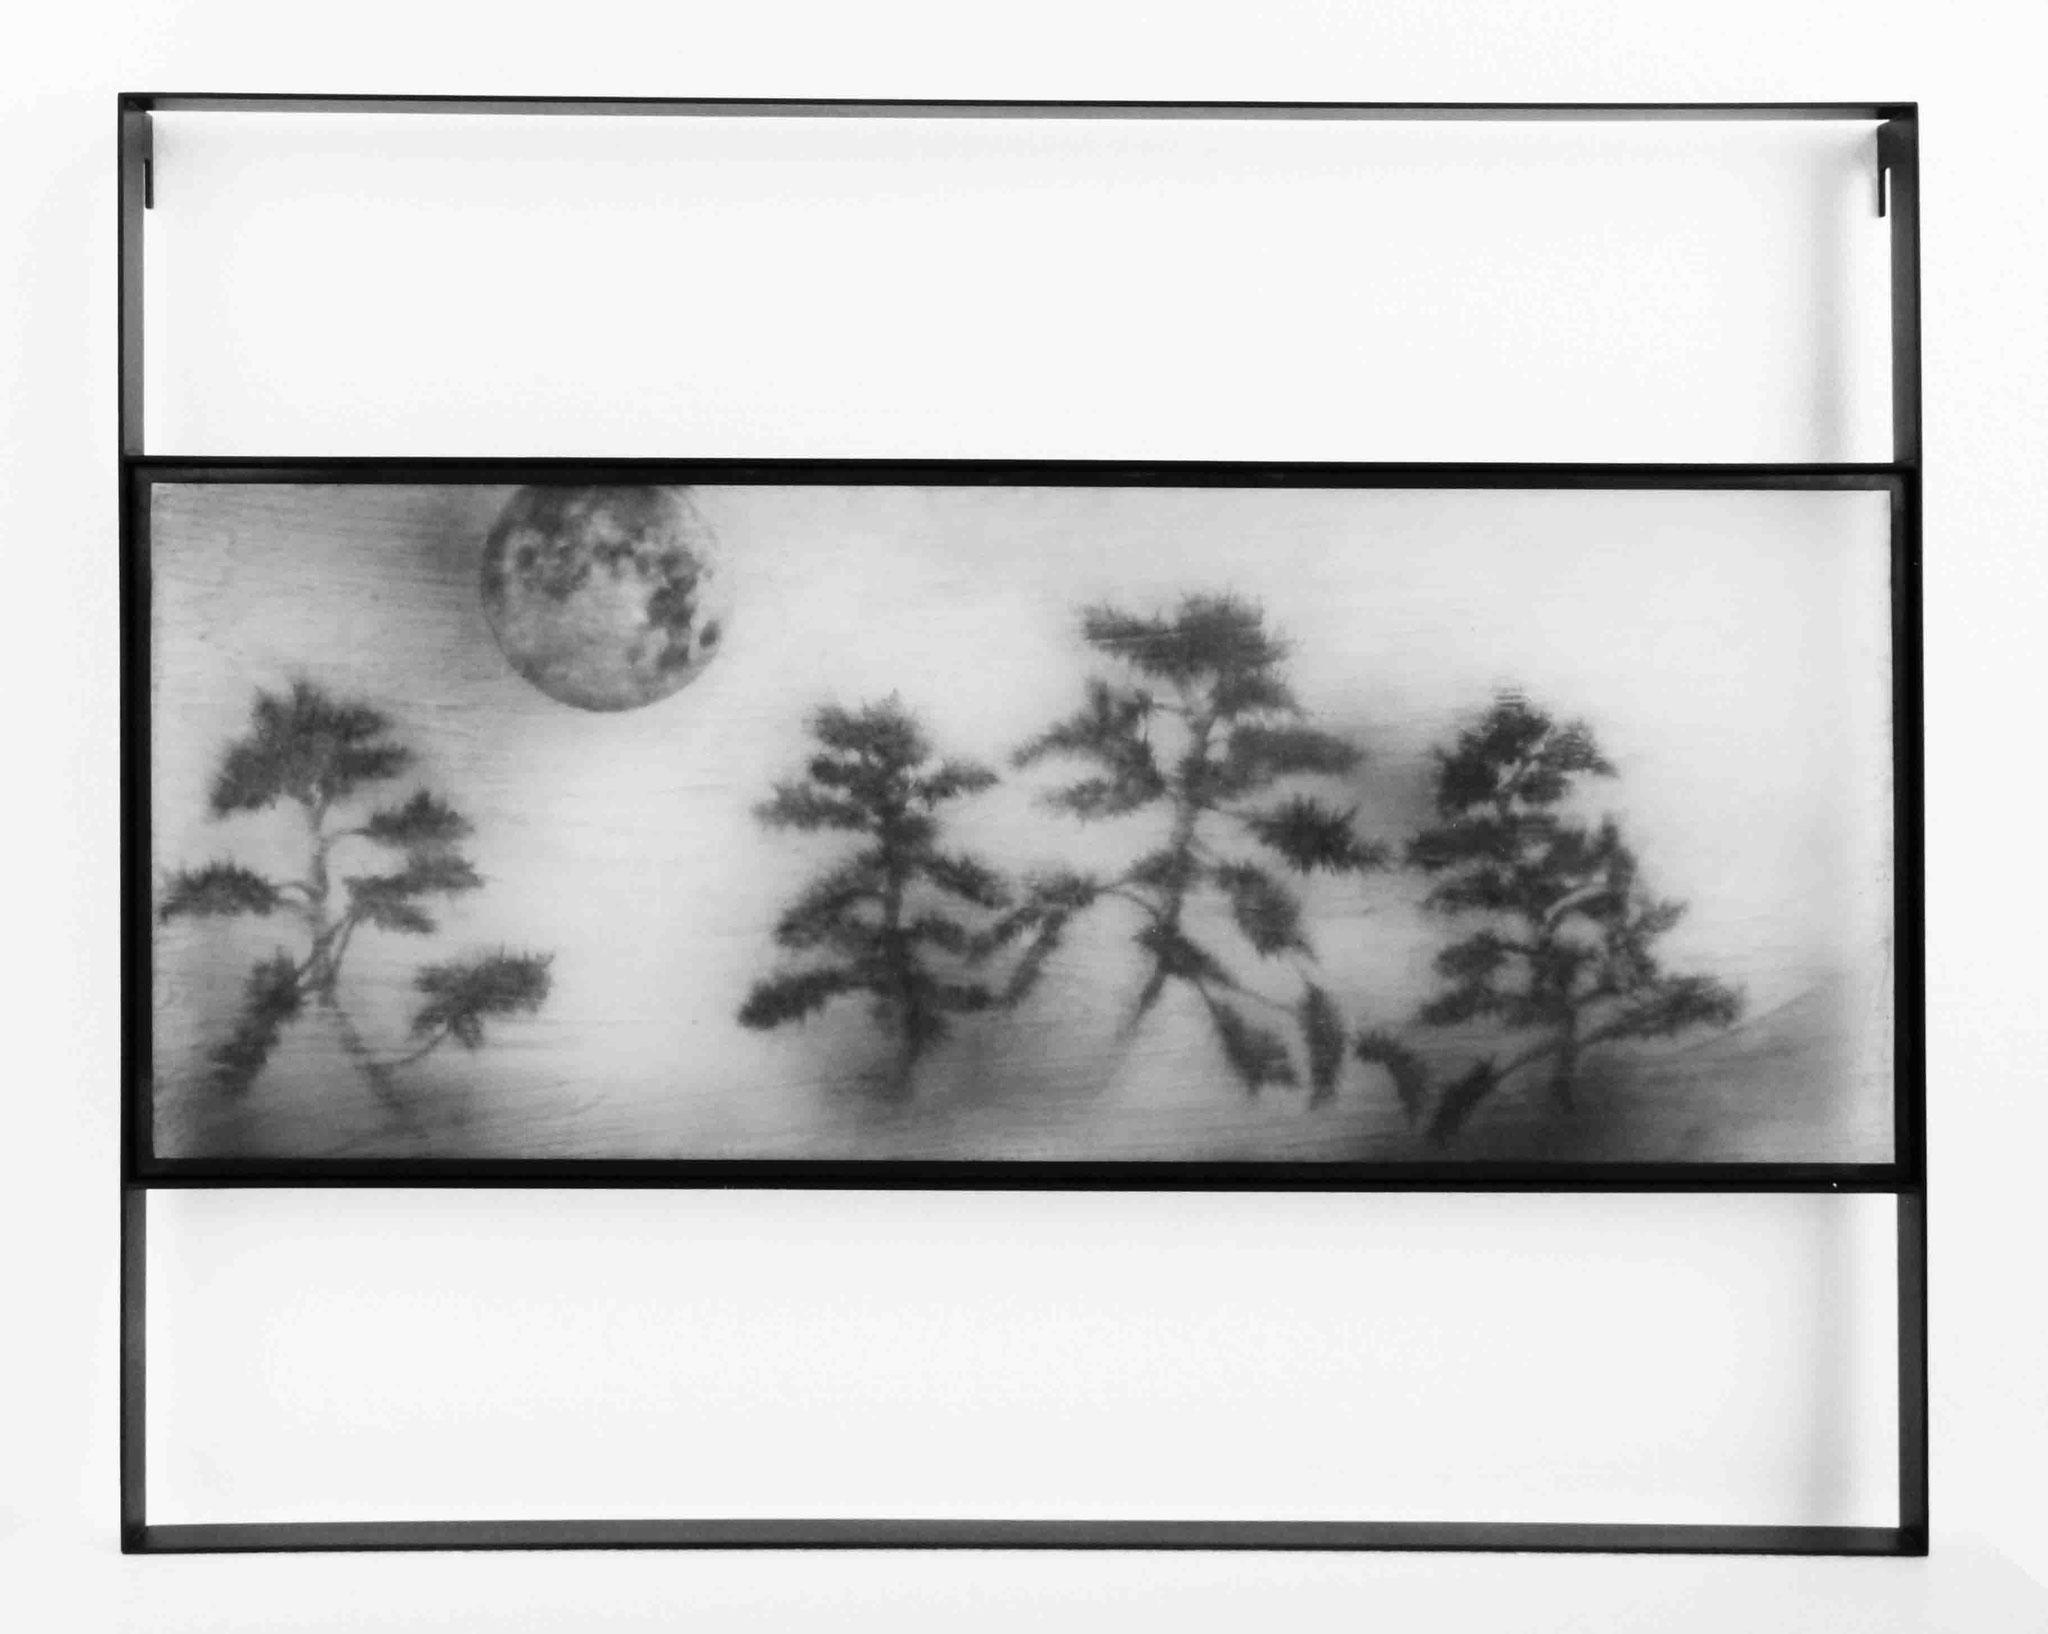 Midnight 2016/ 60cm×74cm×5cm/ Kiln cast, Painted, Japanese ink, Metal frame